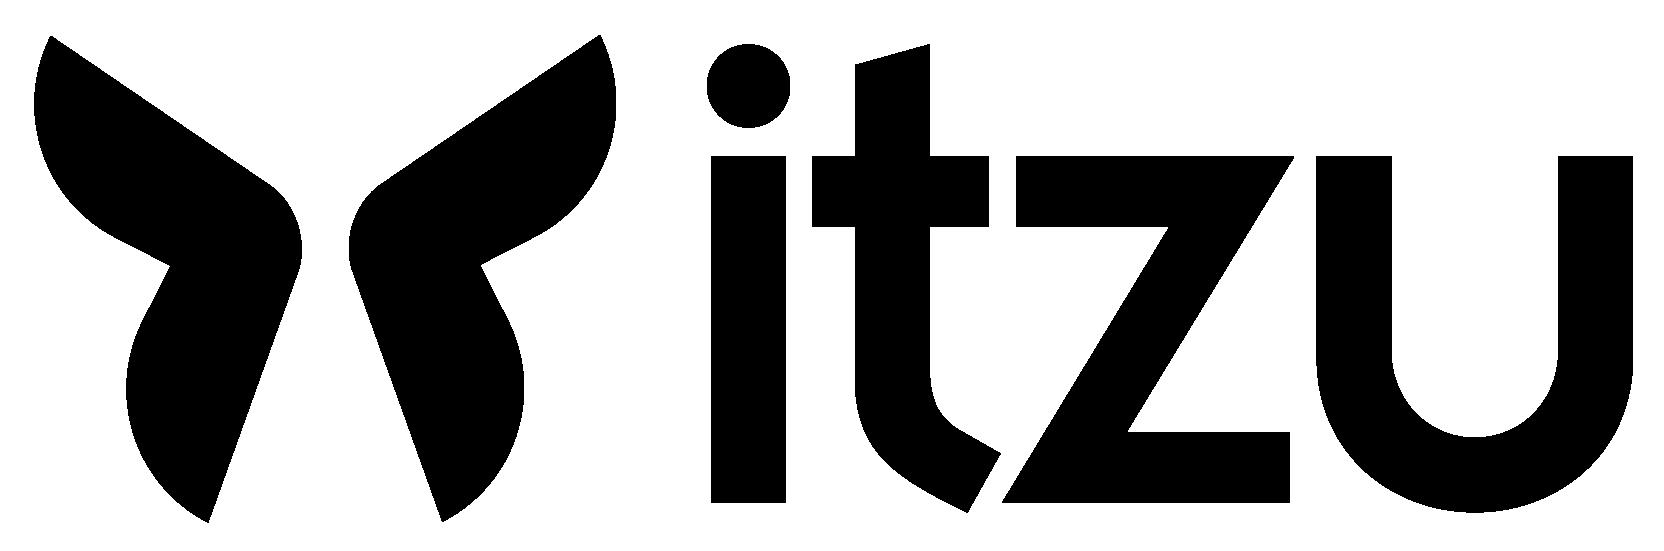 Logo klant van White Light: Itzu